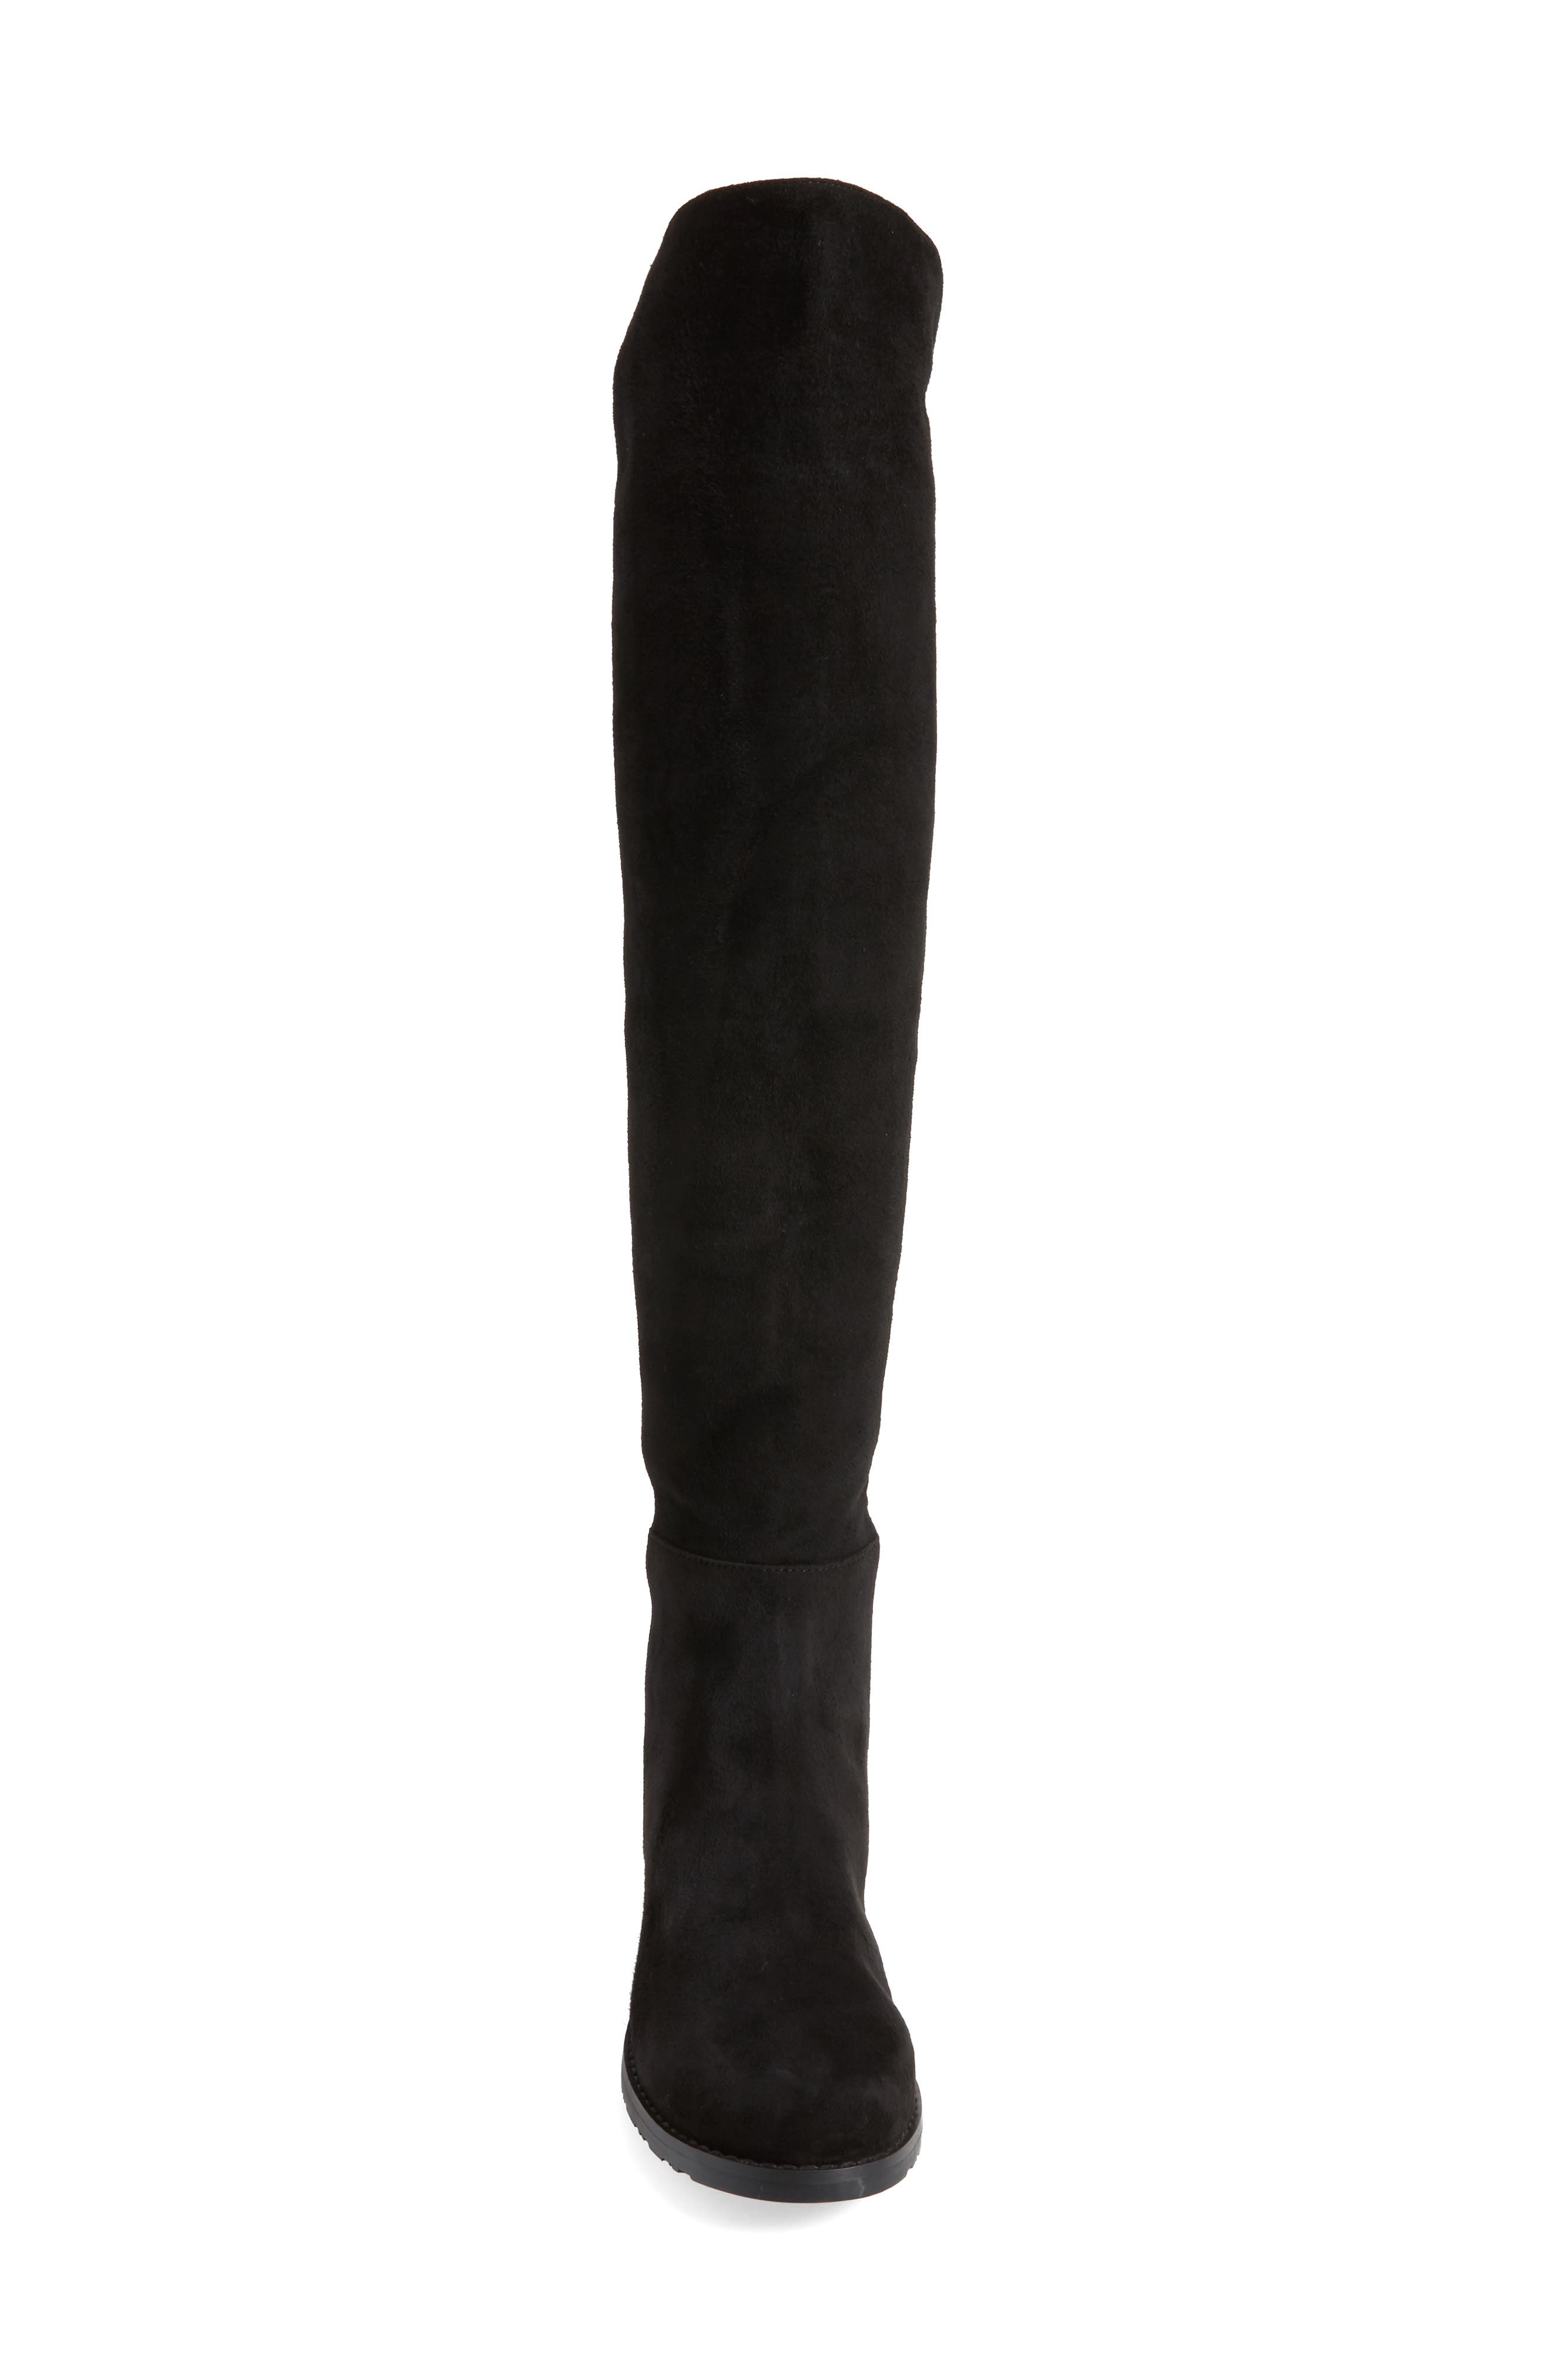 Panache Tall Boot,                             Alternate thumbnail 4, color,                             002